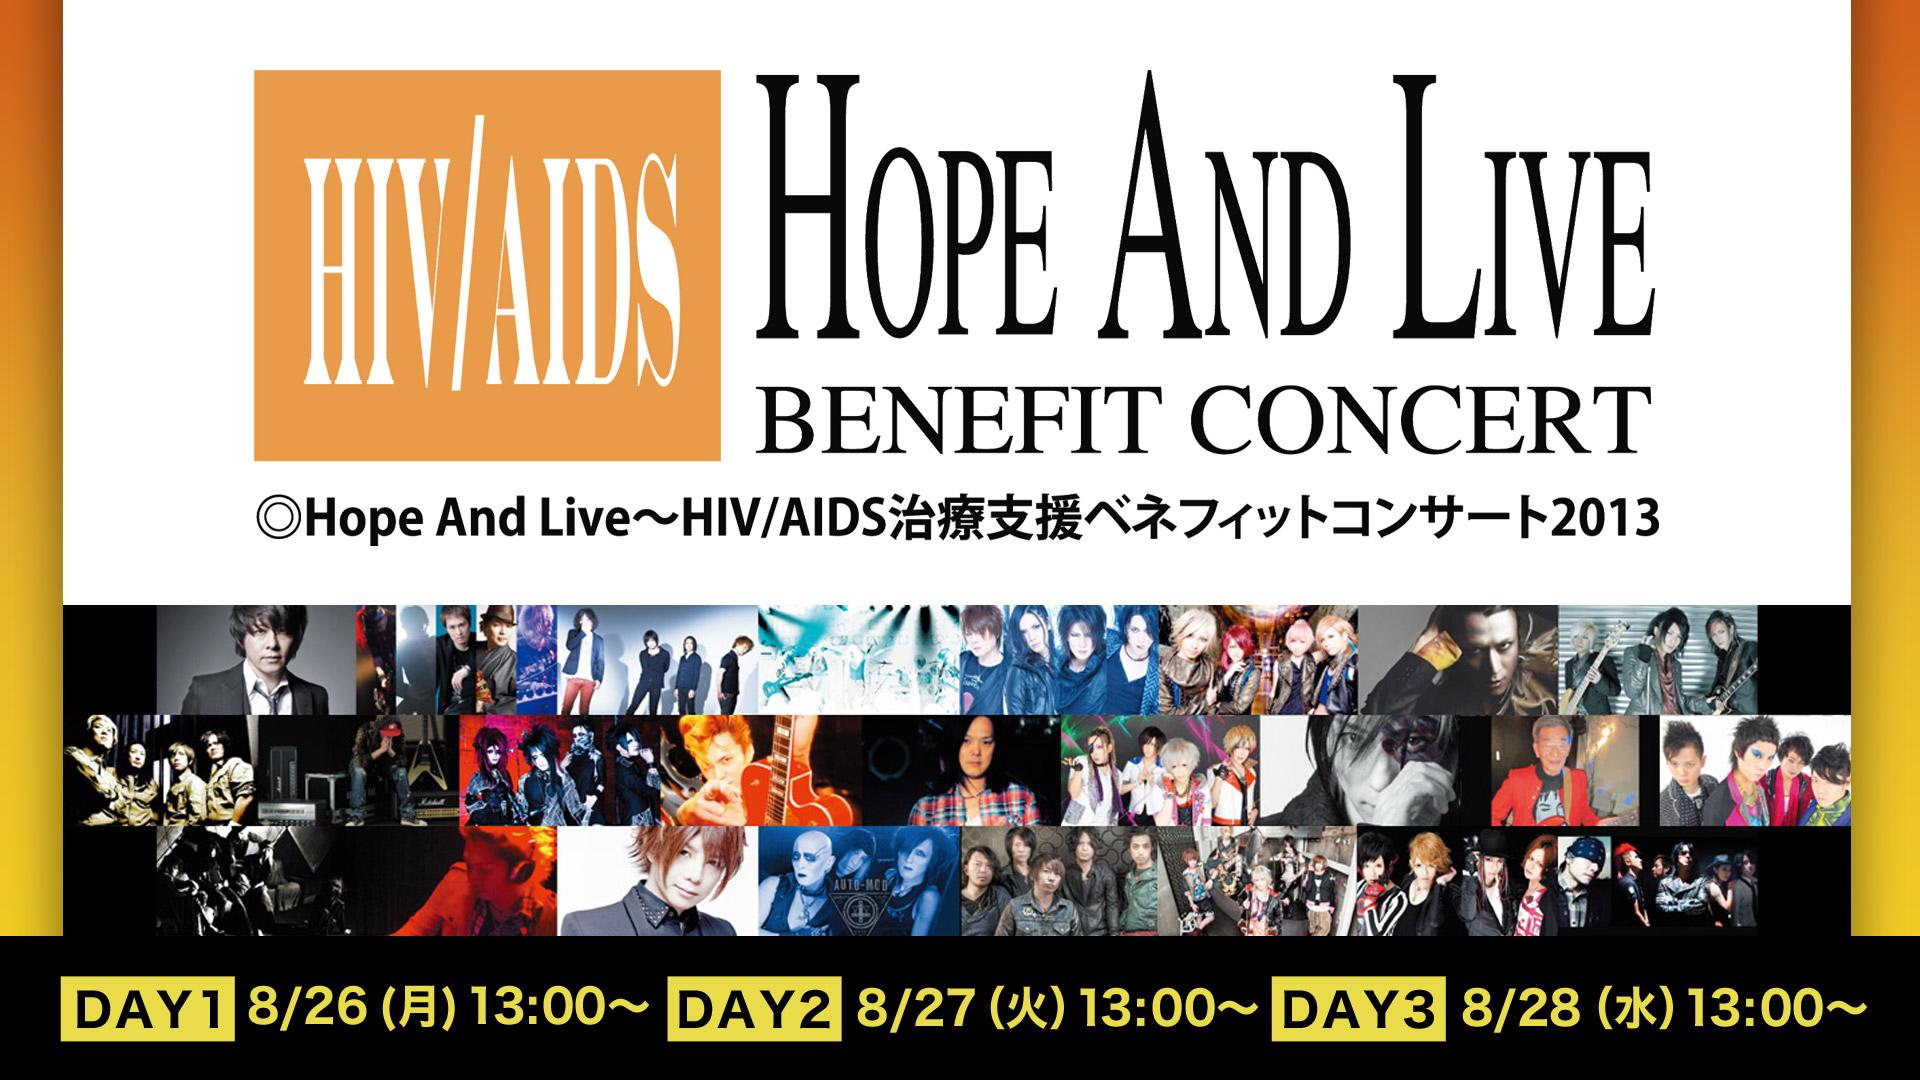 「Hope And Live~HIV/AIDS治療支援ベネフィット・コンサート2013」